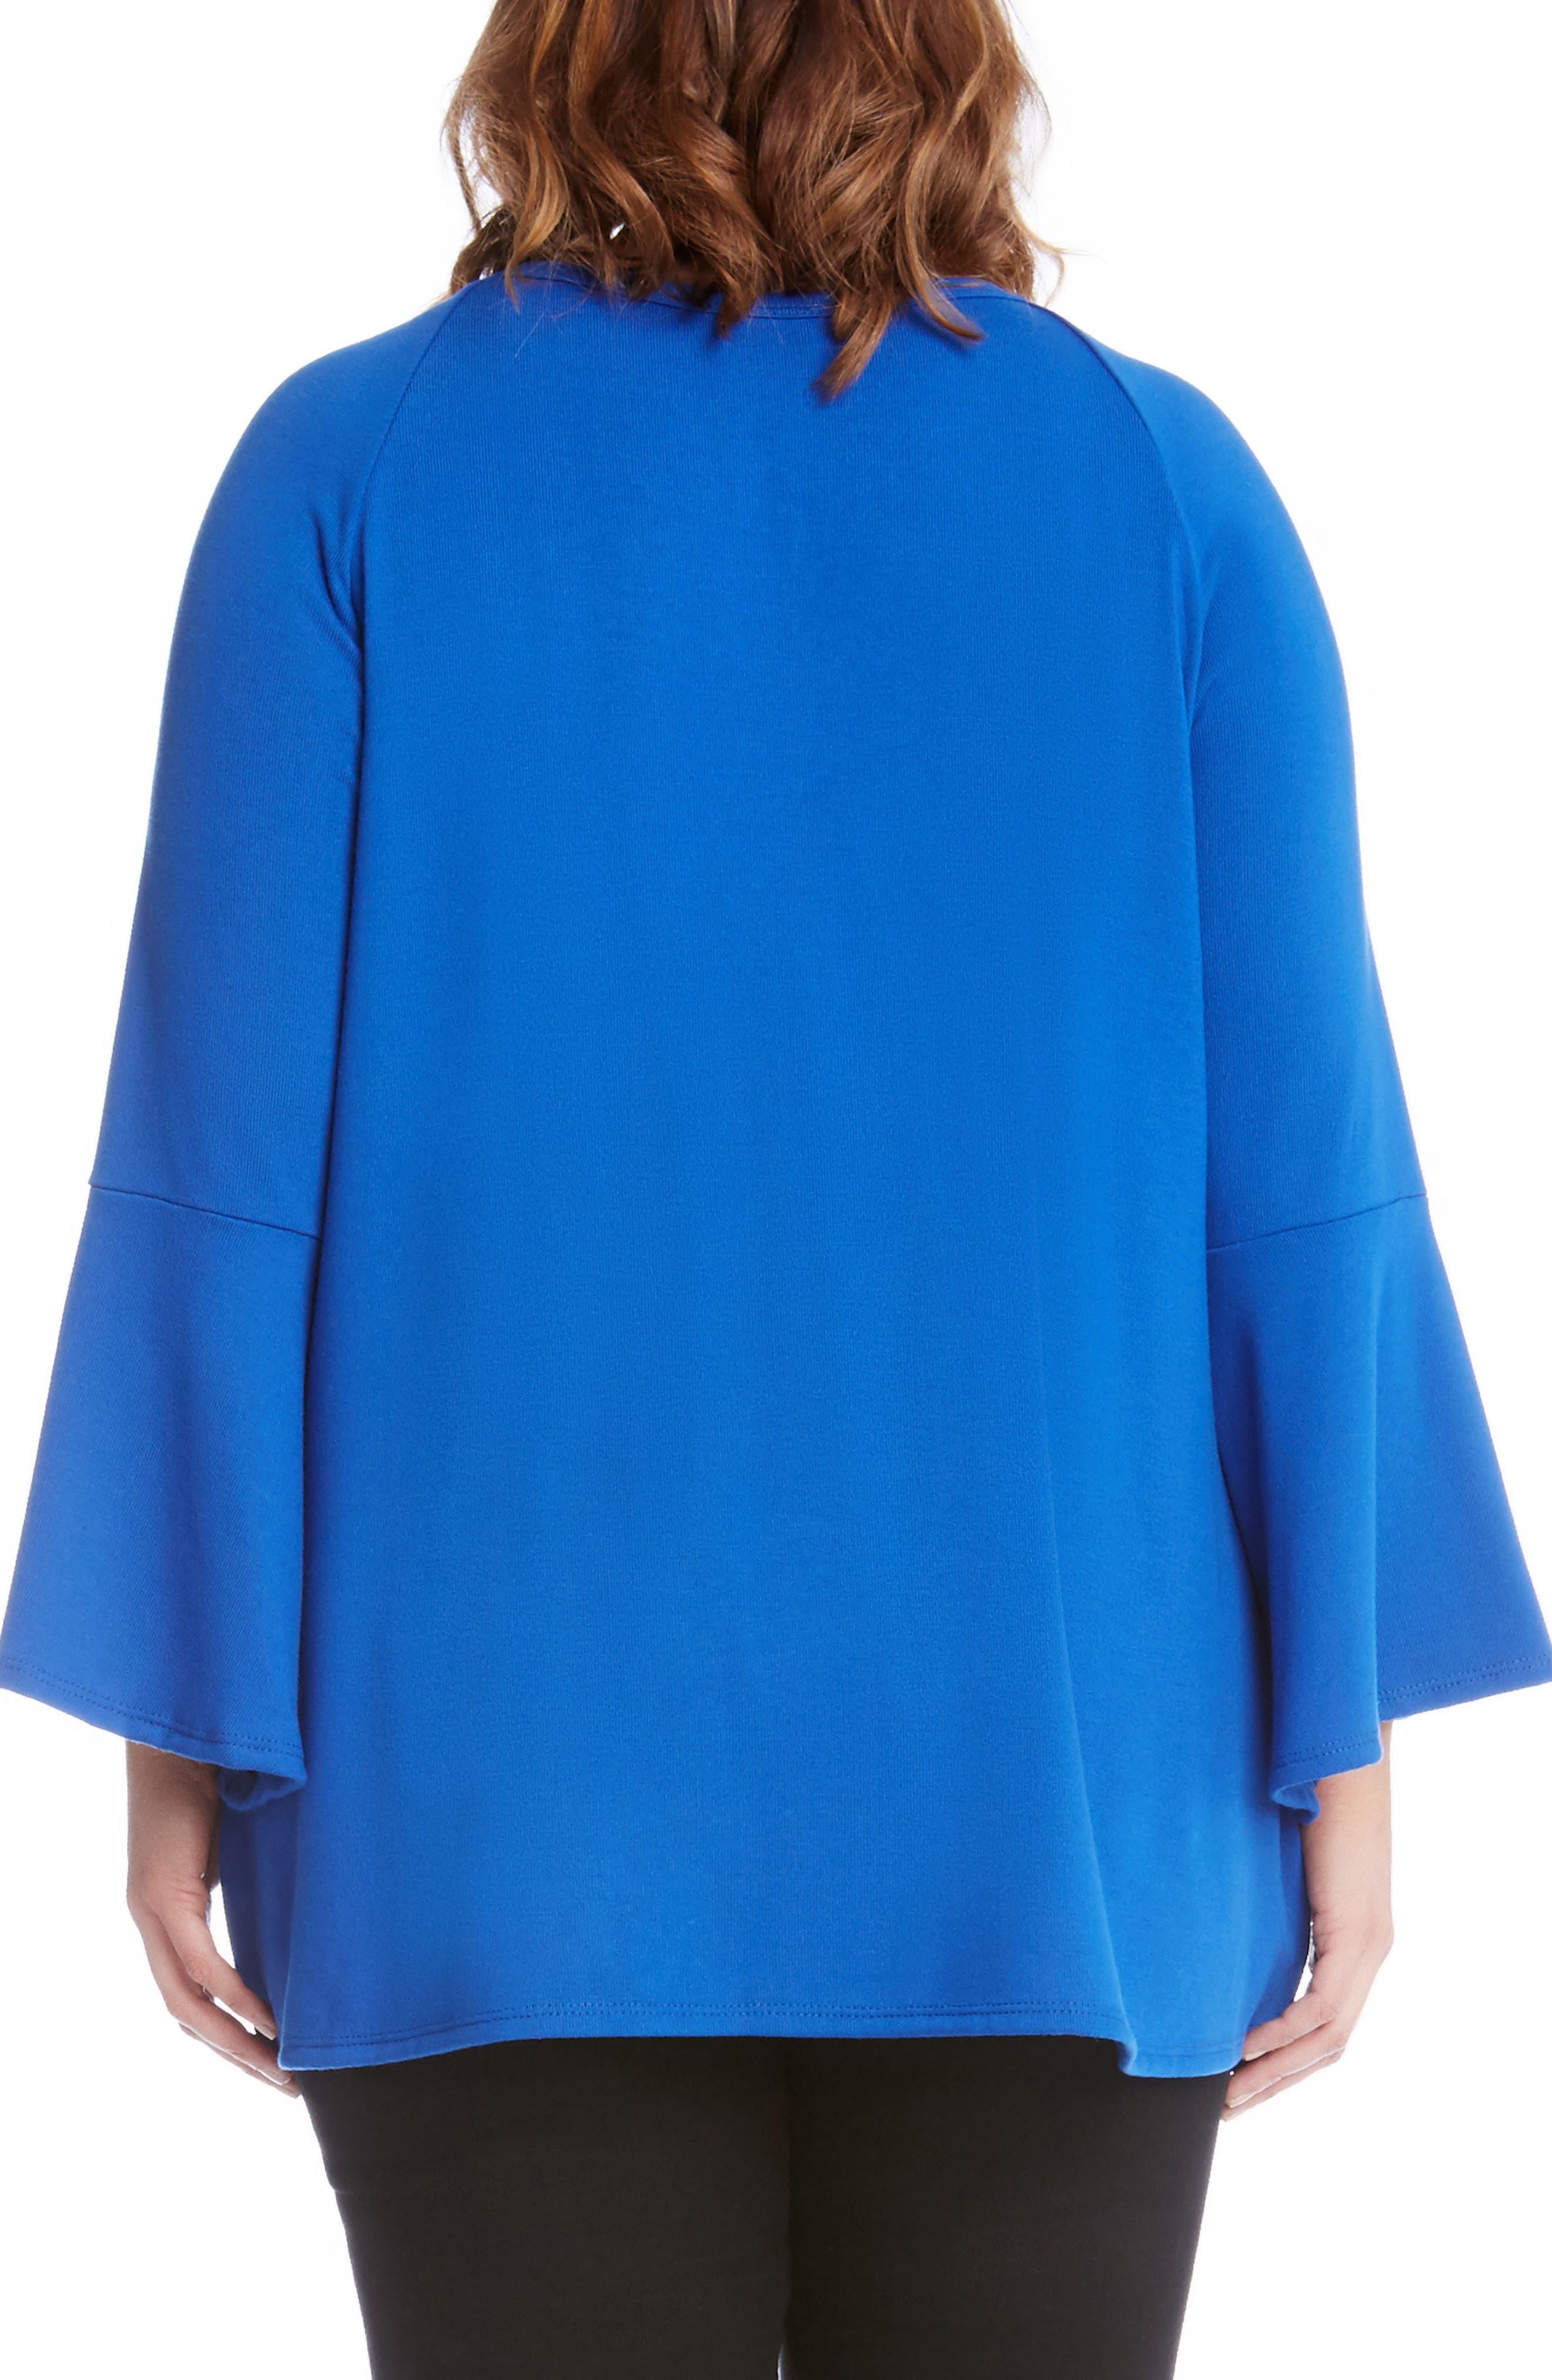 Bell Sleeve Swing Sweater,                             Alternate thumbnail 2, color,                             Blue